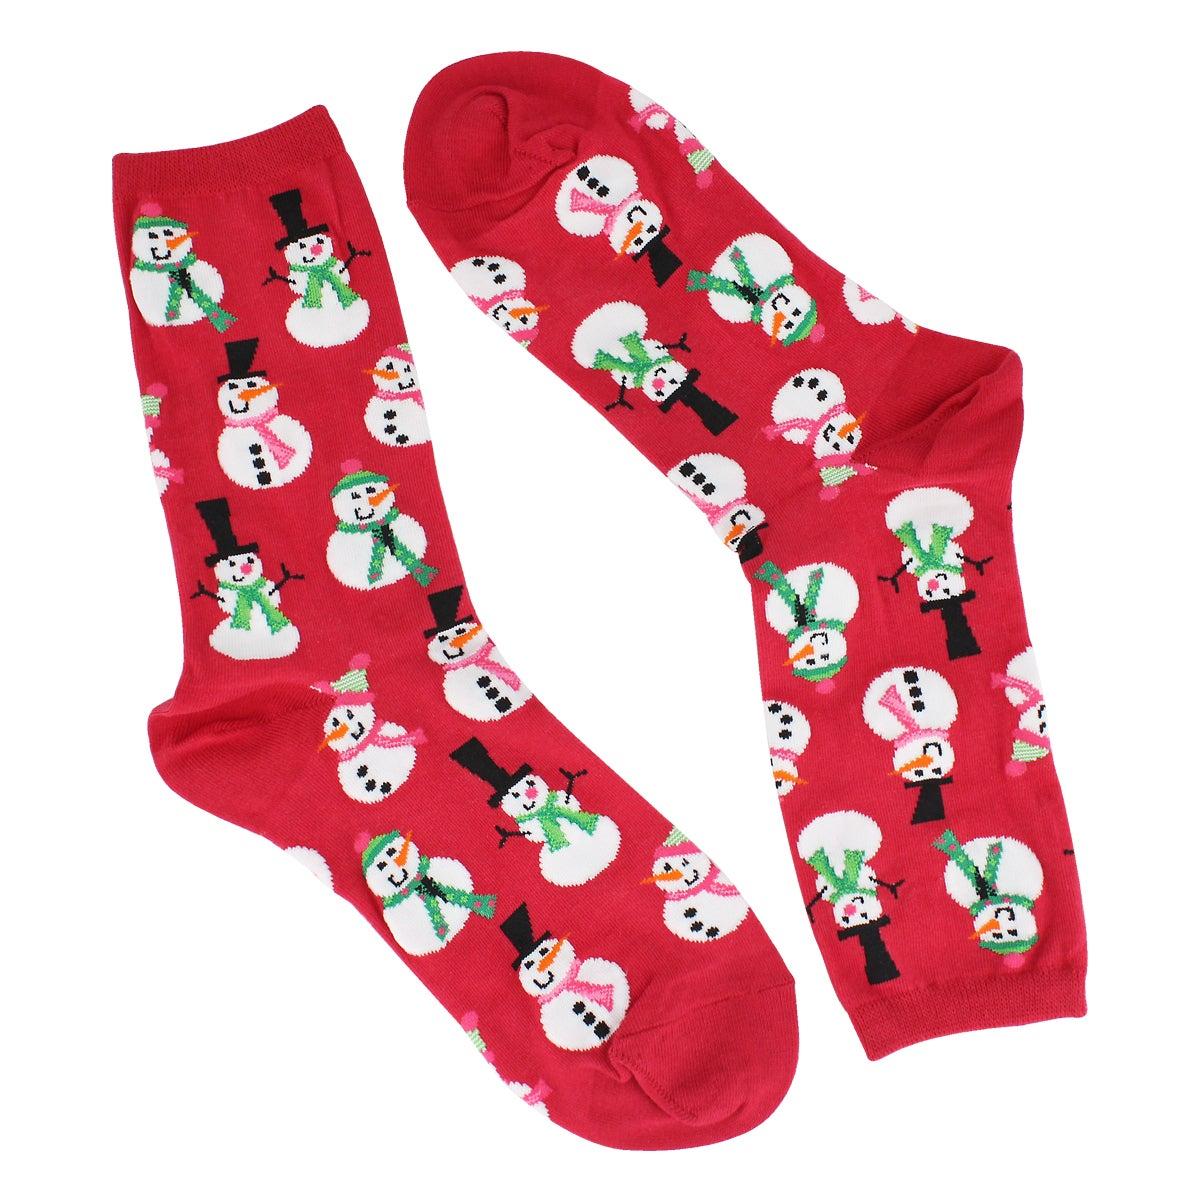 Women's Snowmen Sock - Red Printed